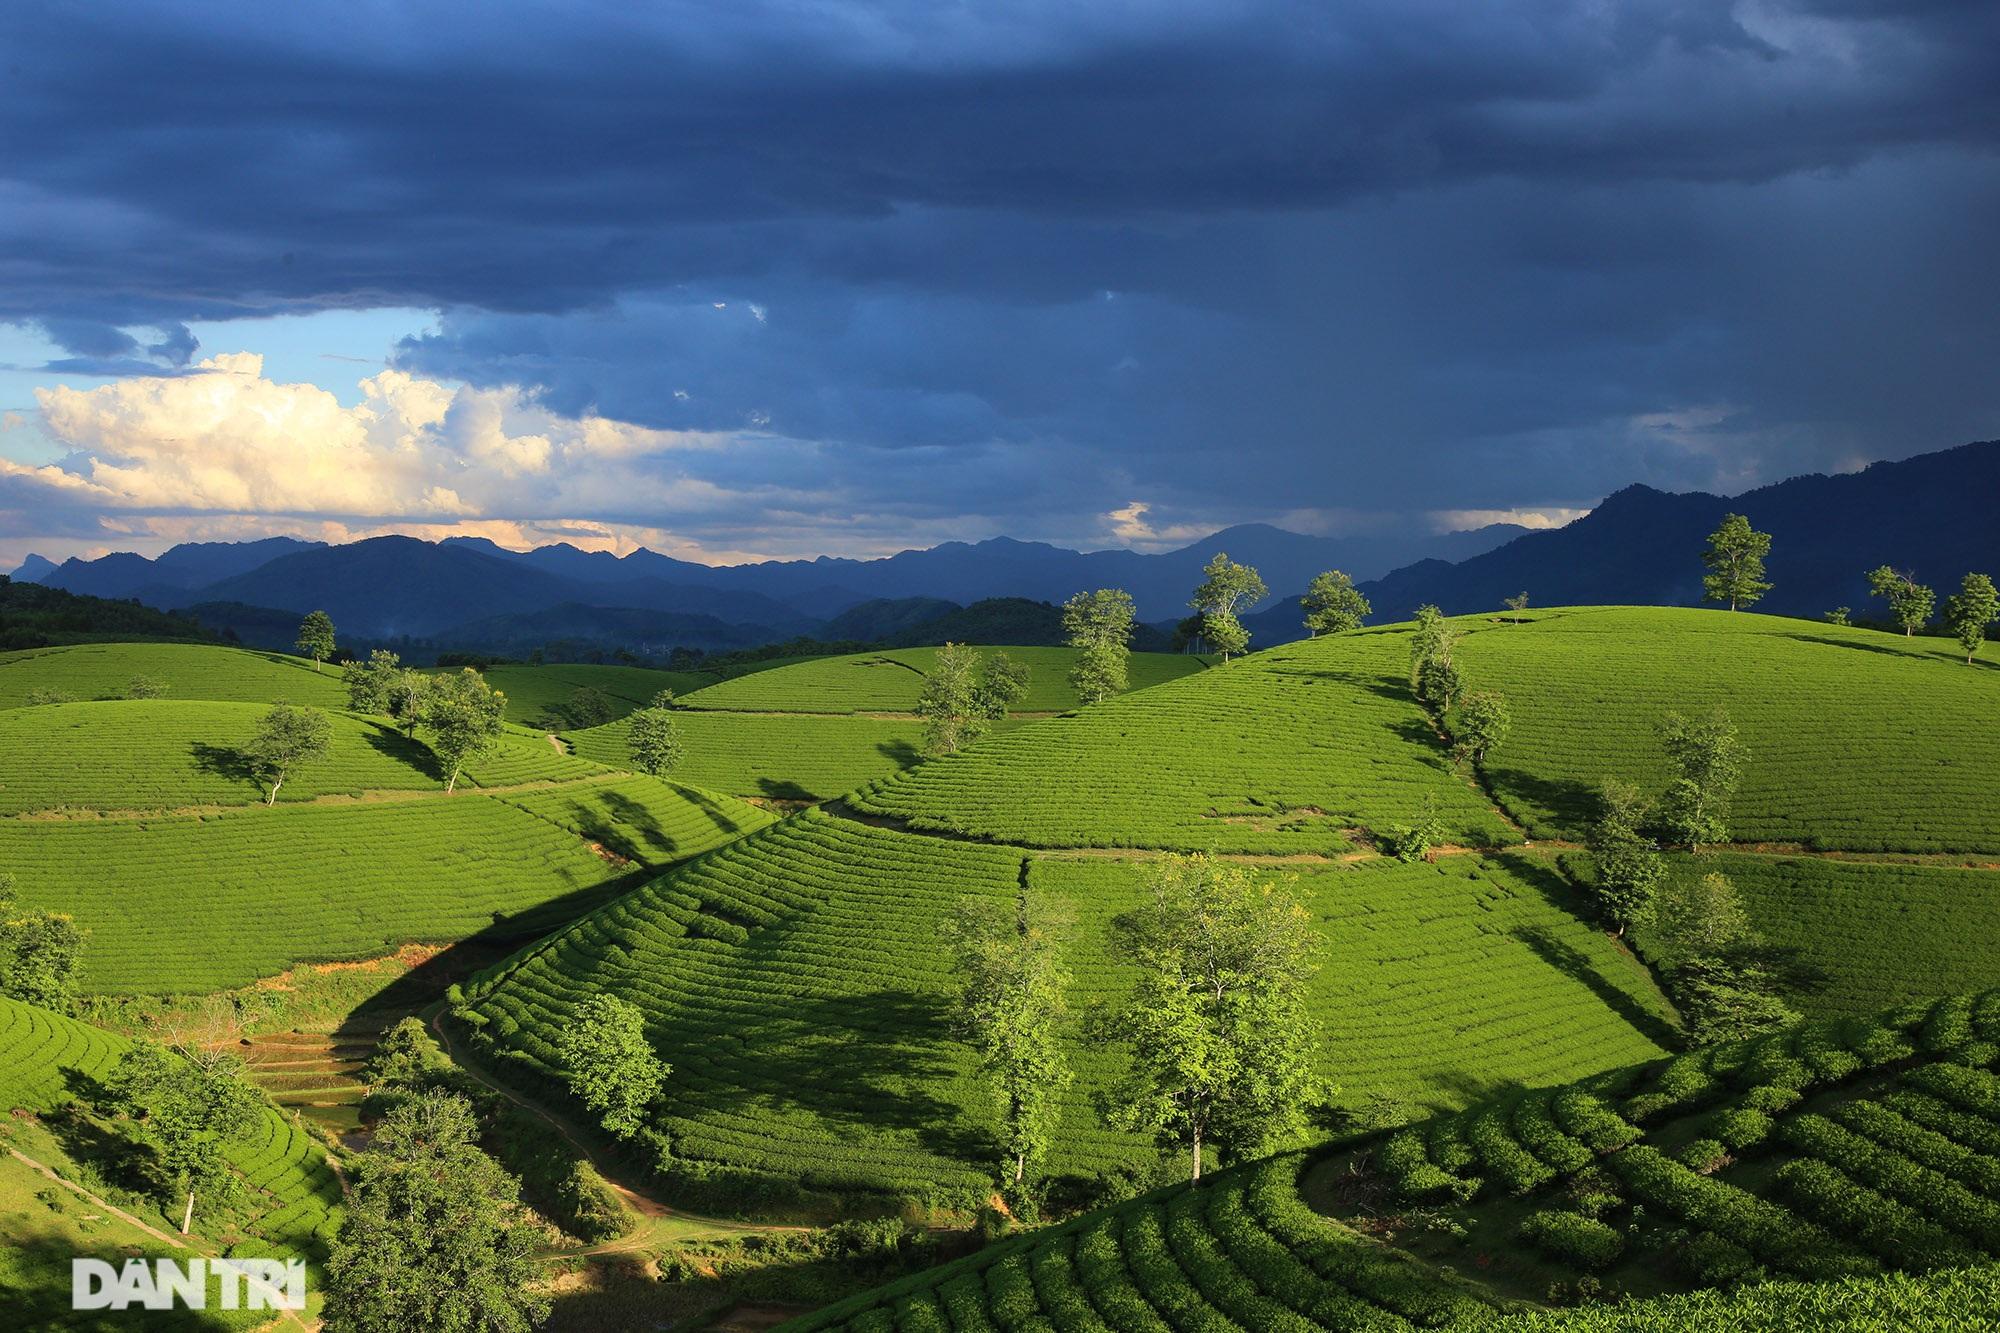 Overwhelming scenery of Long Coc tea hills in Phu Tho - 5